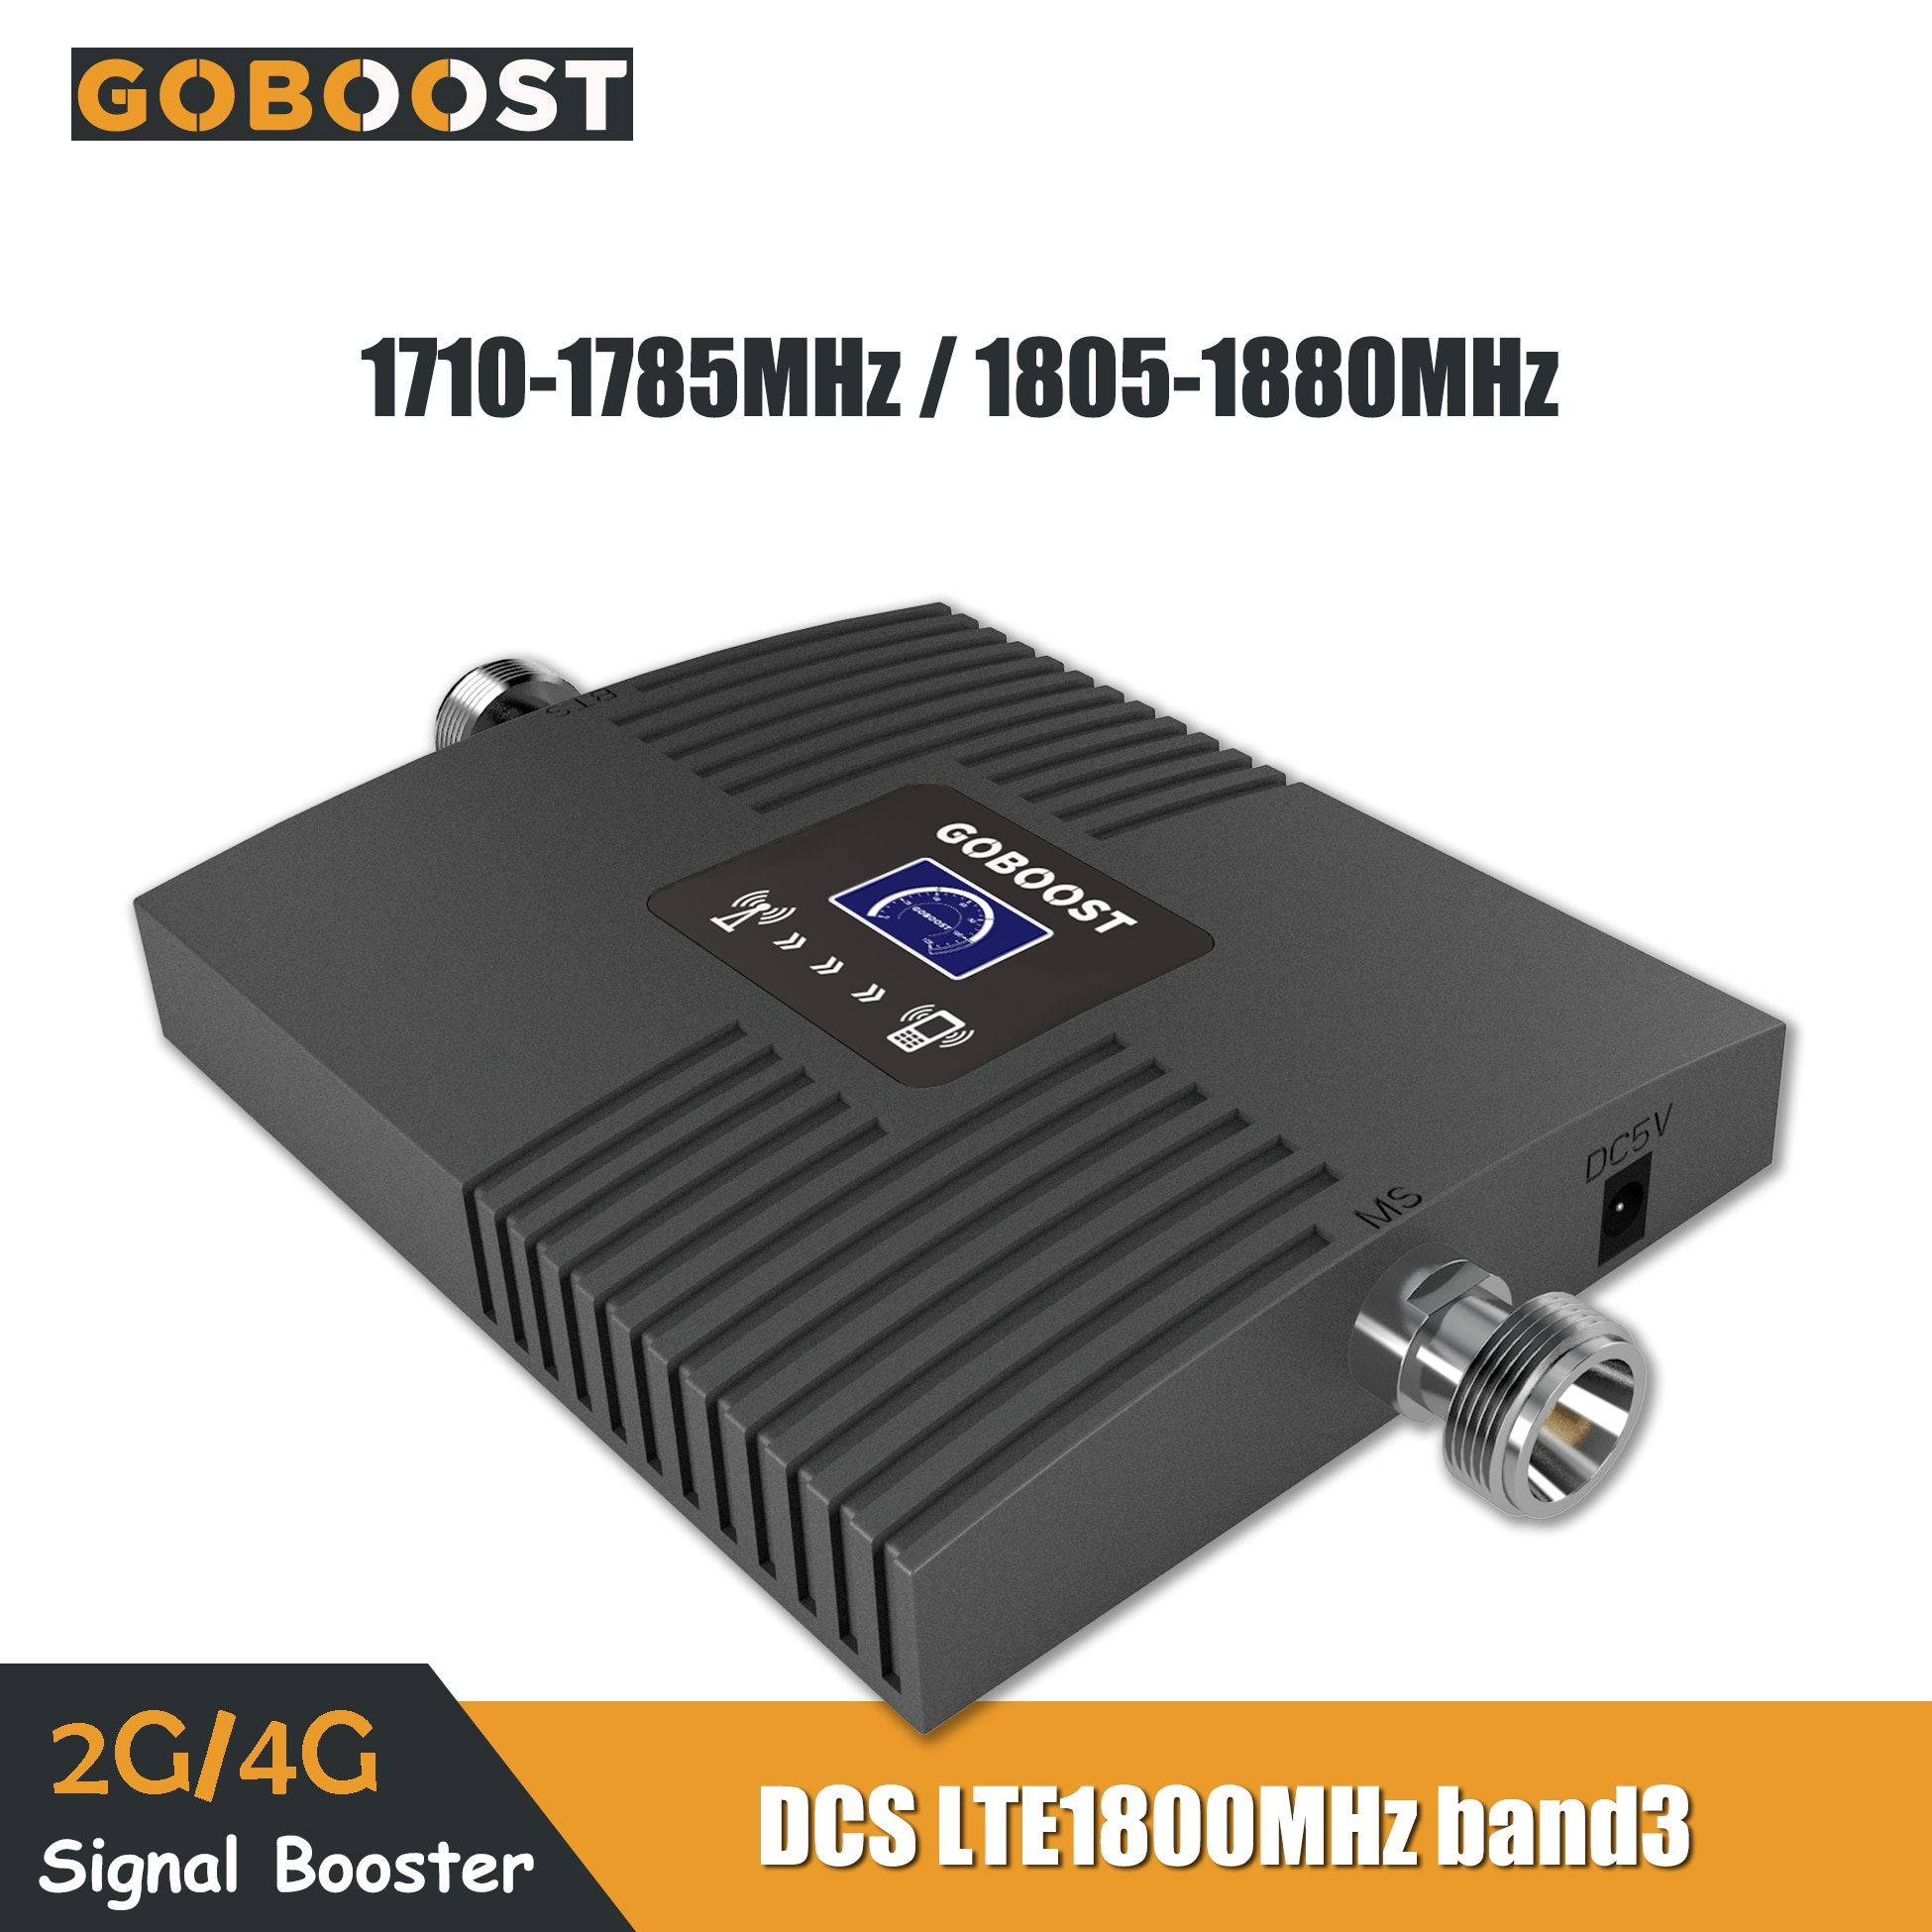 GOBOOST, repetidor GSM 1800 4G LTE, Amplificador de señal móvil, pantalla LCD Band3 DCS, mini amplificador móvil, repetidor de teléfono móvil 1800MHz